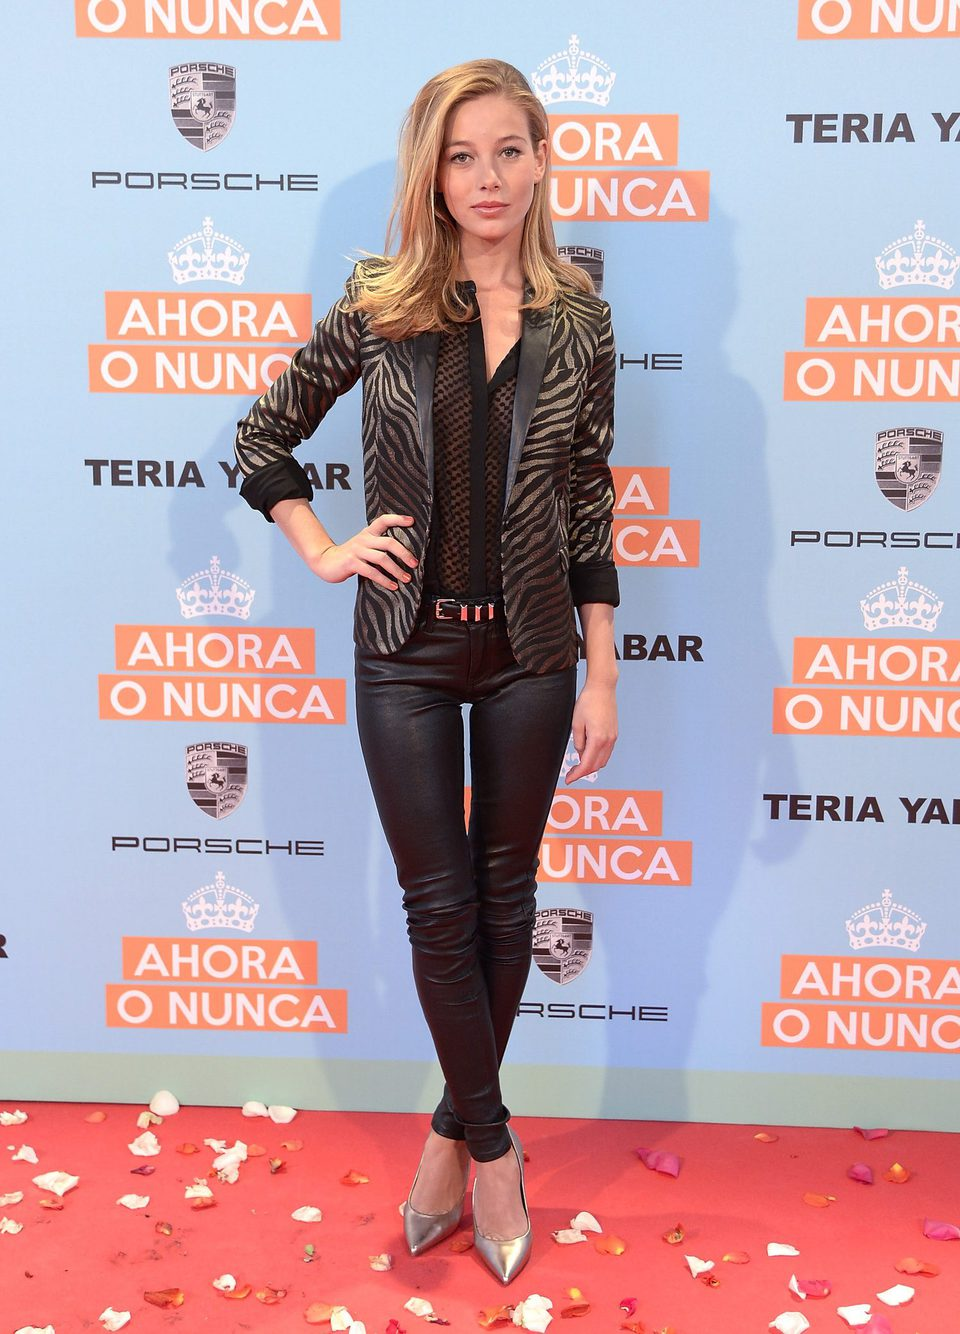 Charlotte Vega en la premiere de 'Ahora o nunca'